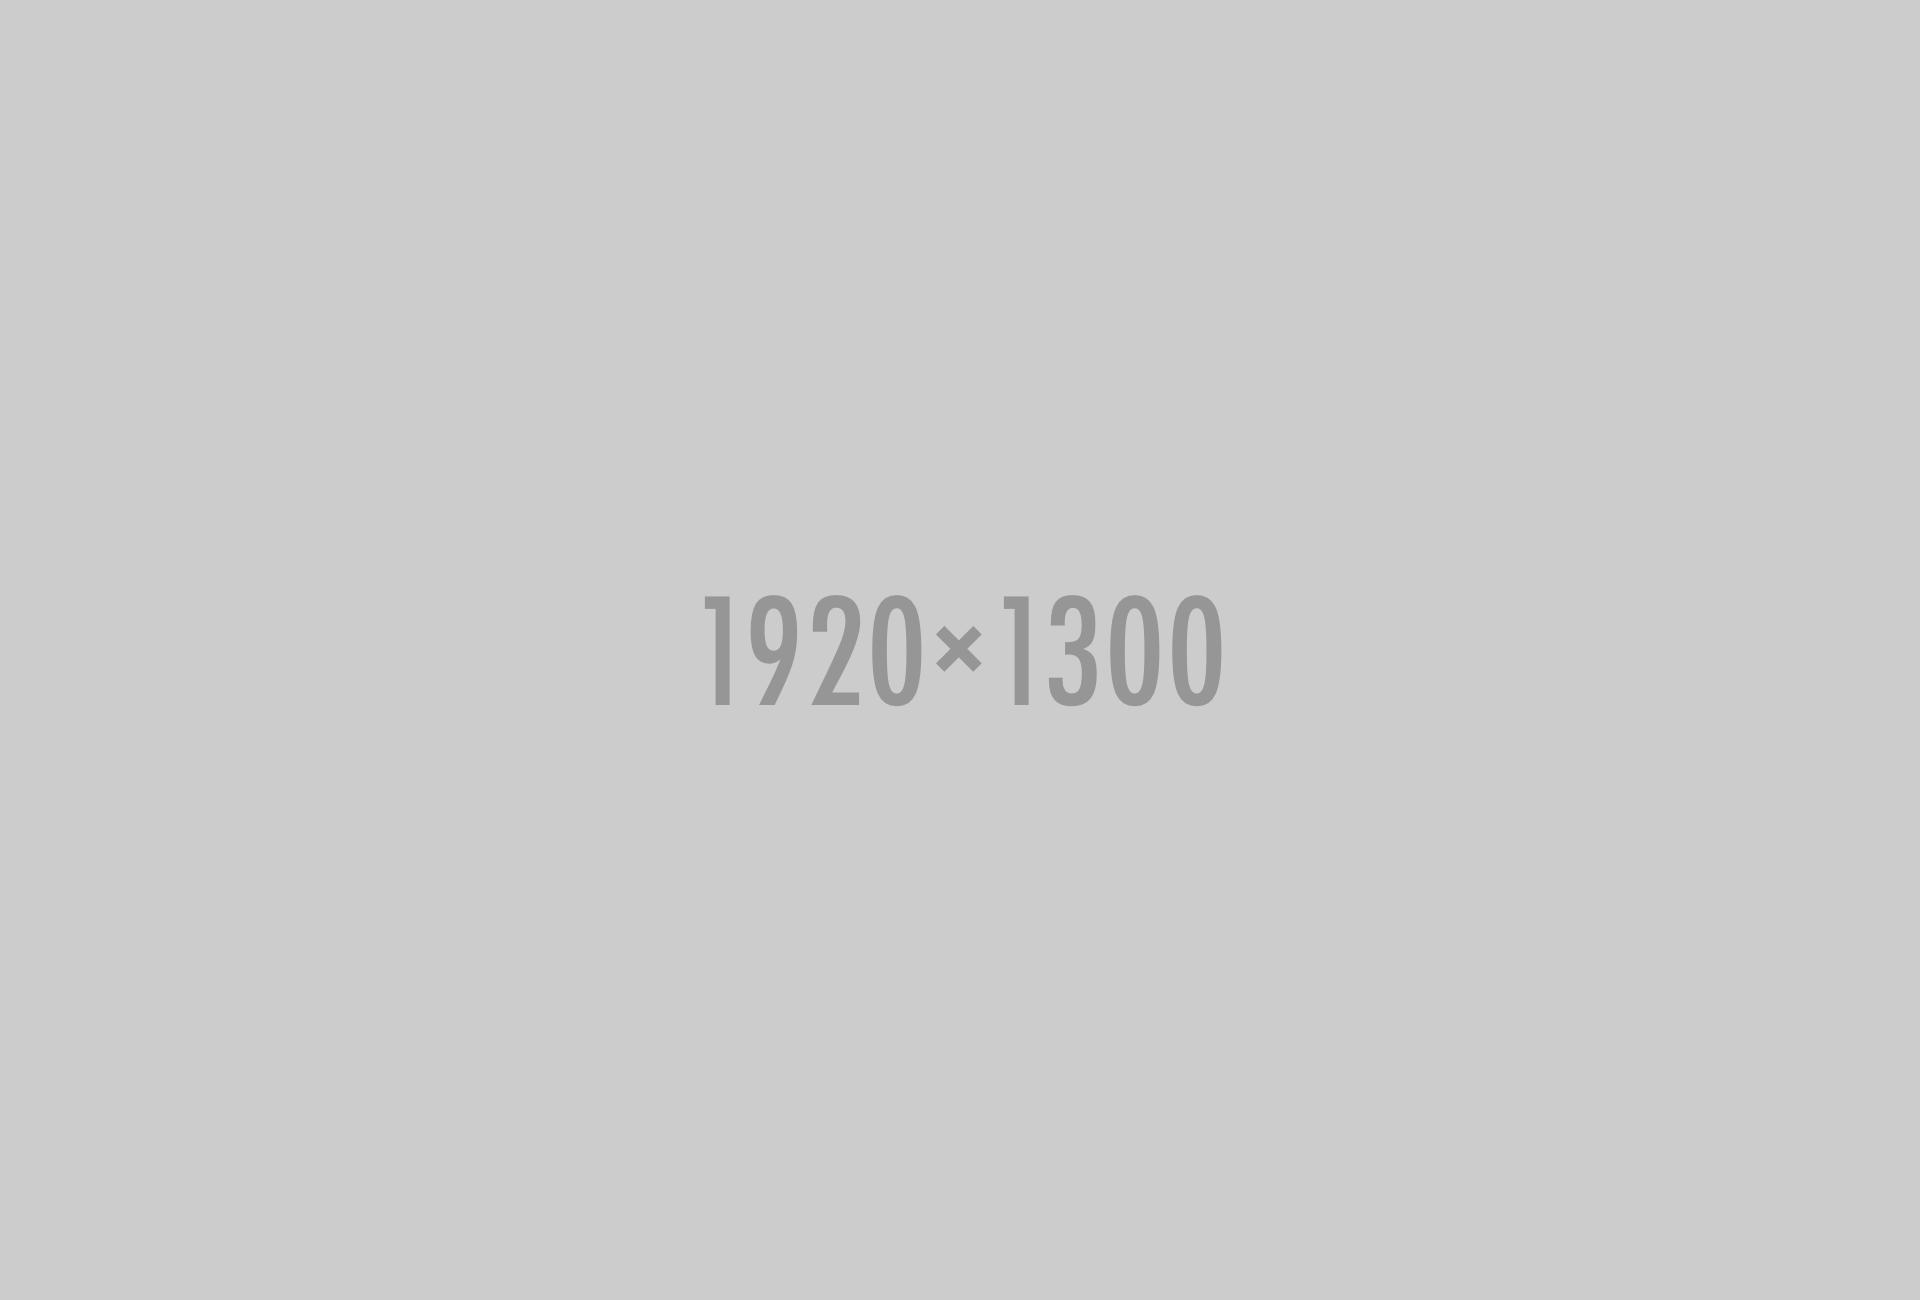 1920x1300